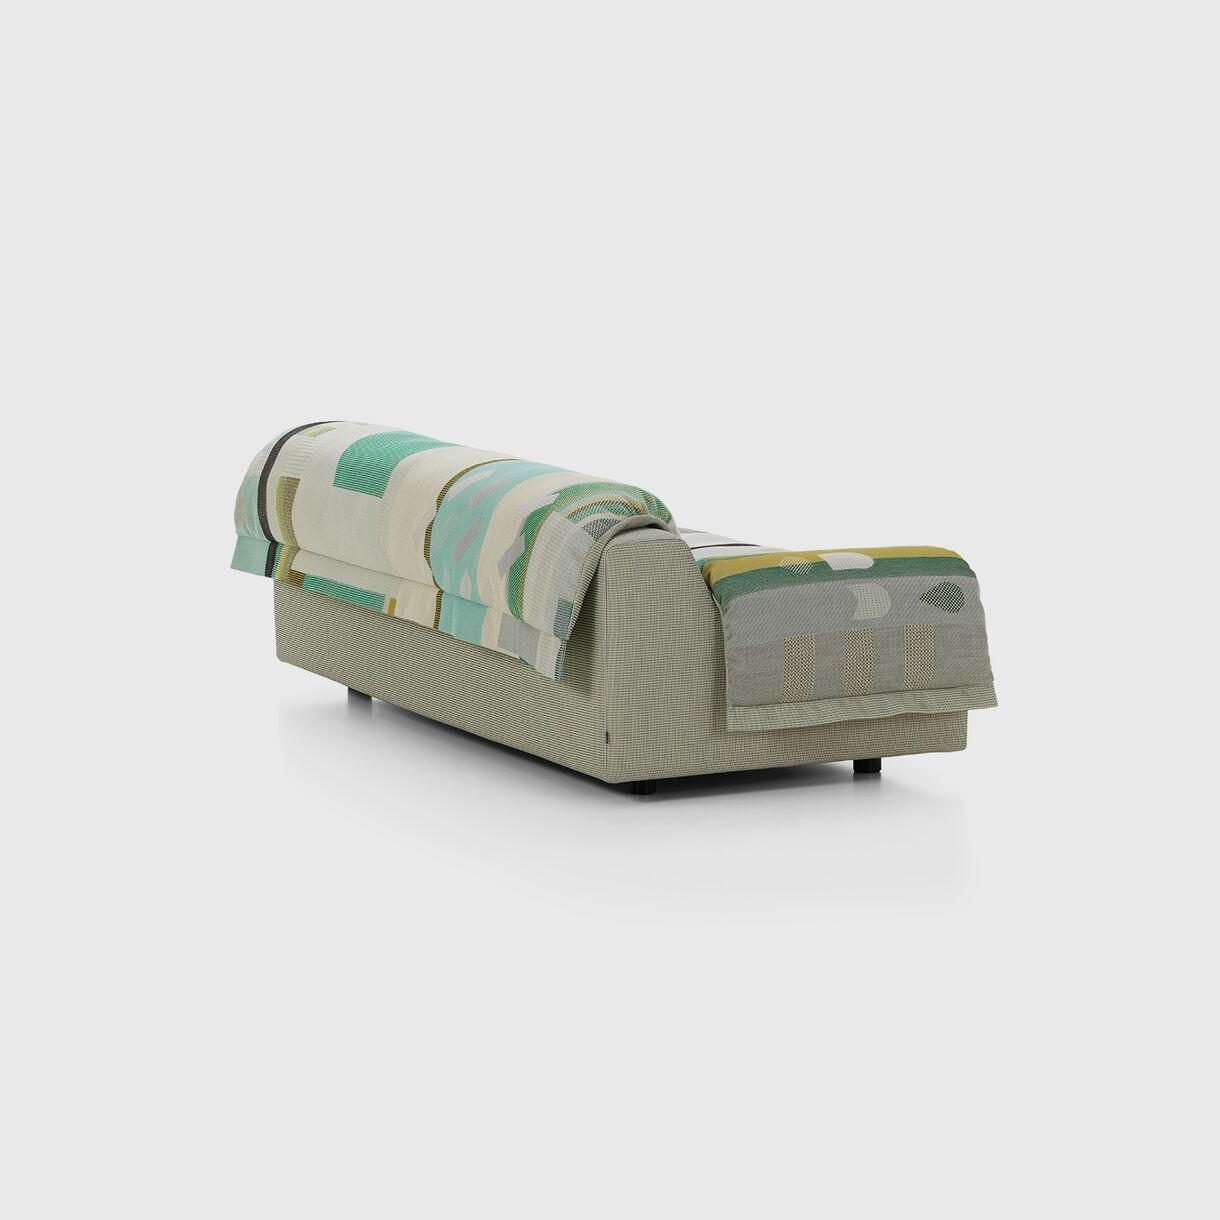 Vlinder Sofa, Light Greens